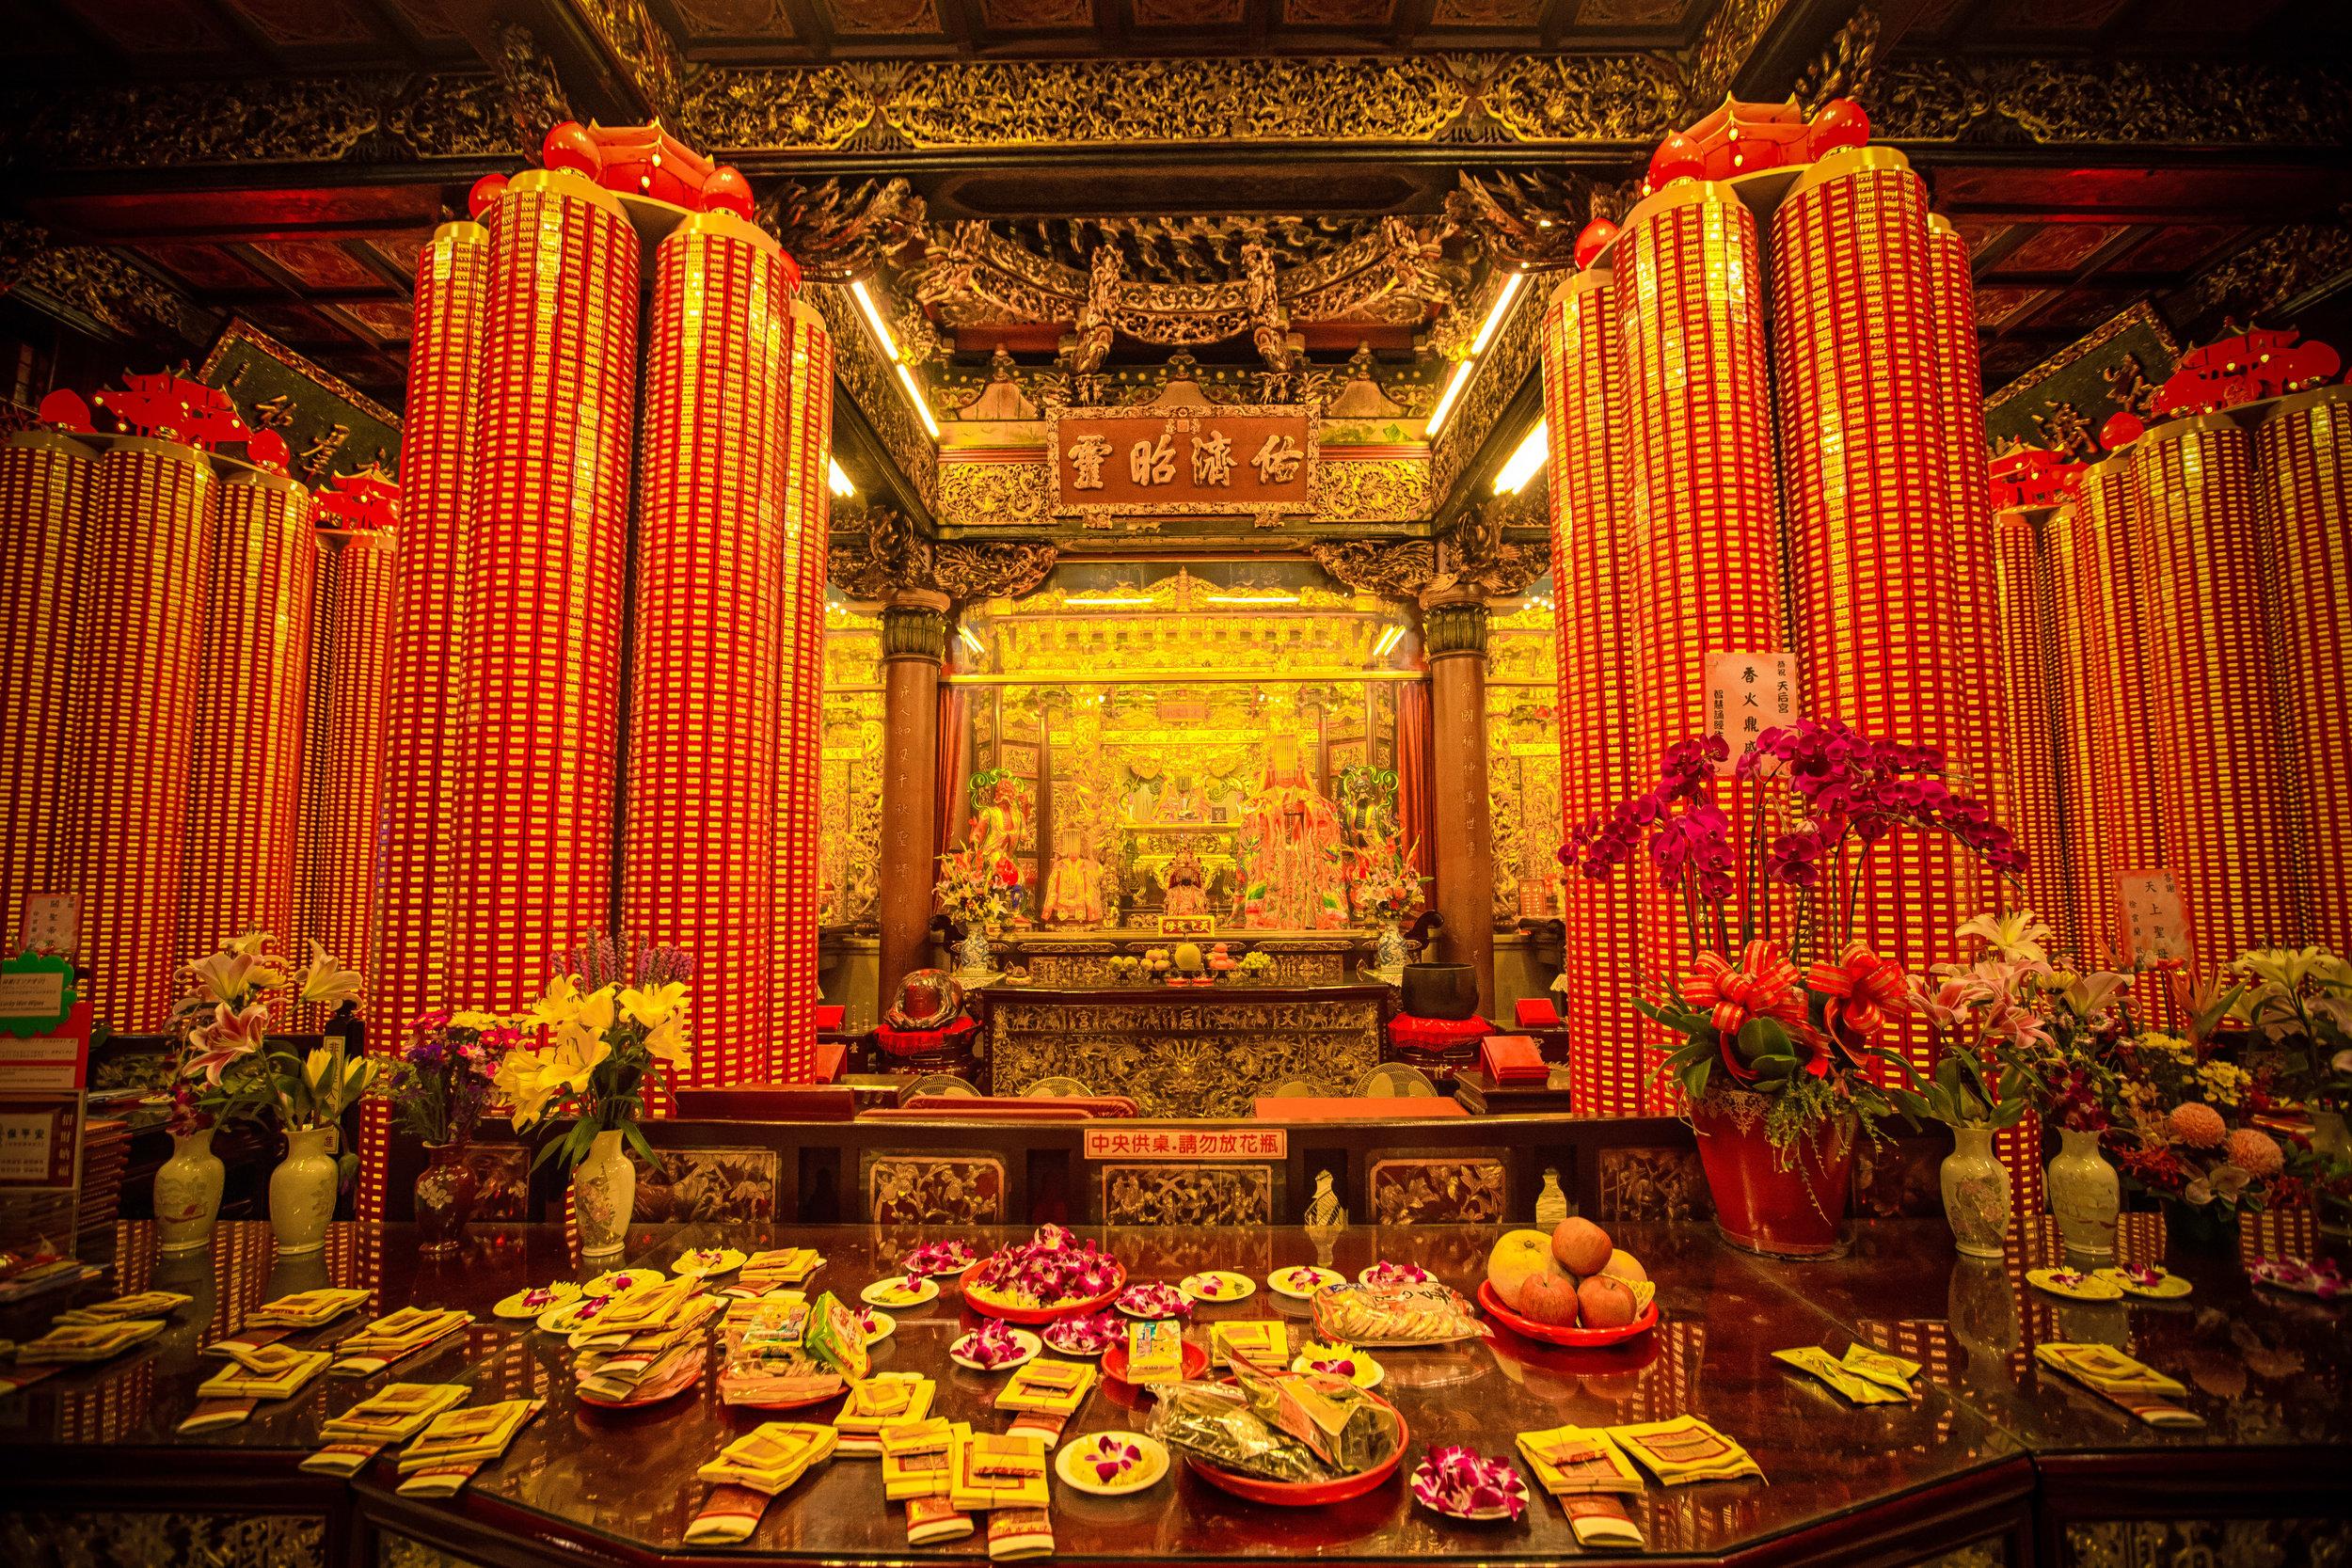 The Main Shrine Room